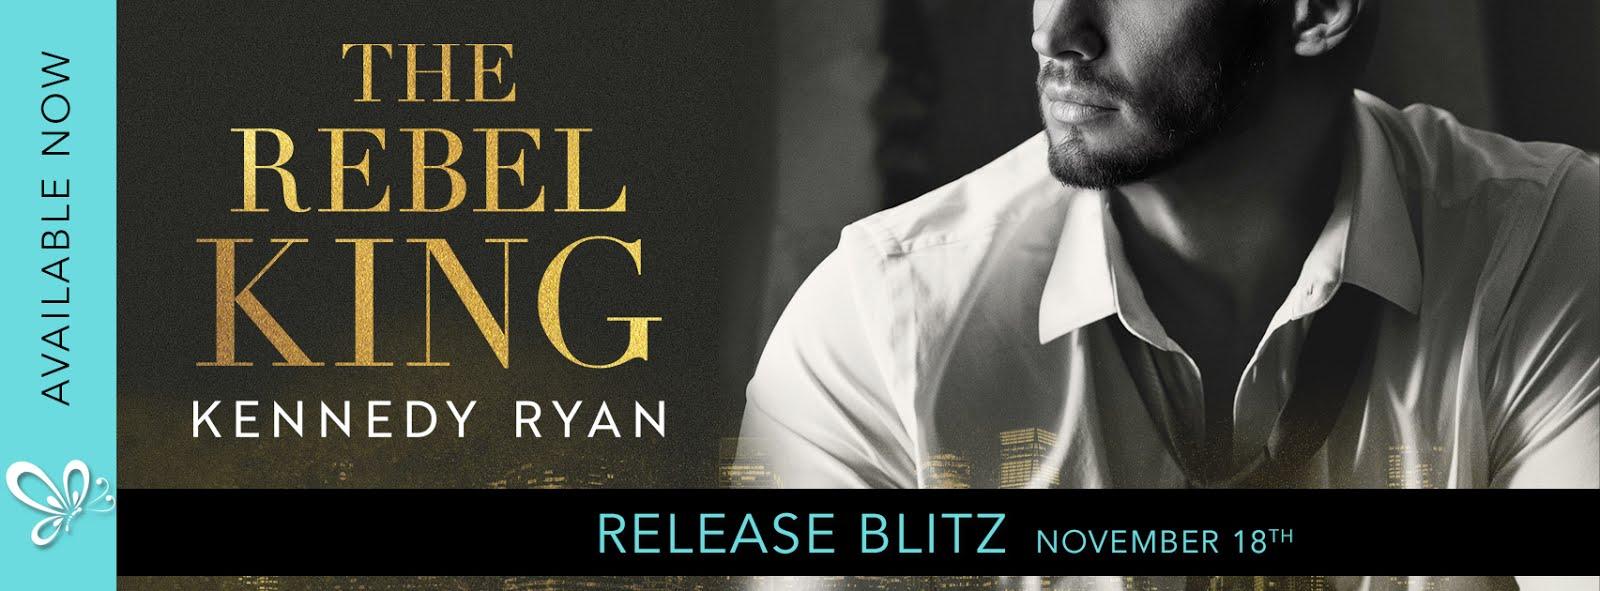 The Rebel King Release Blitz